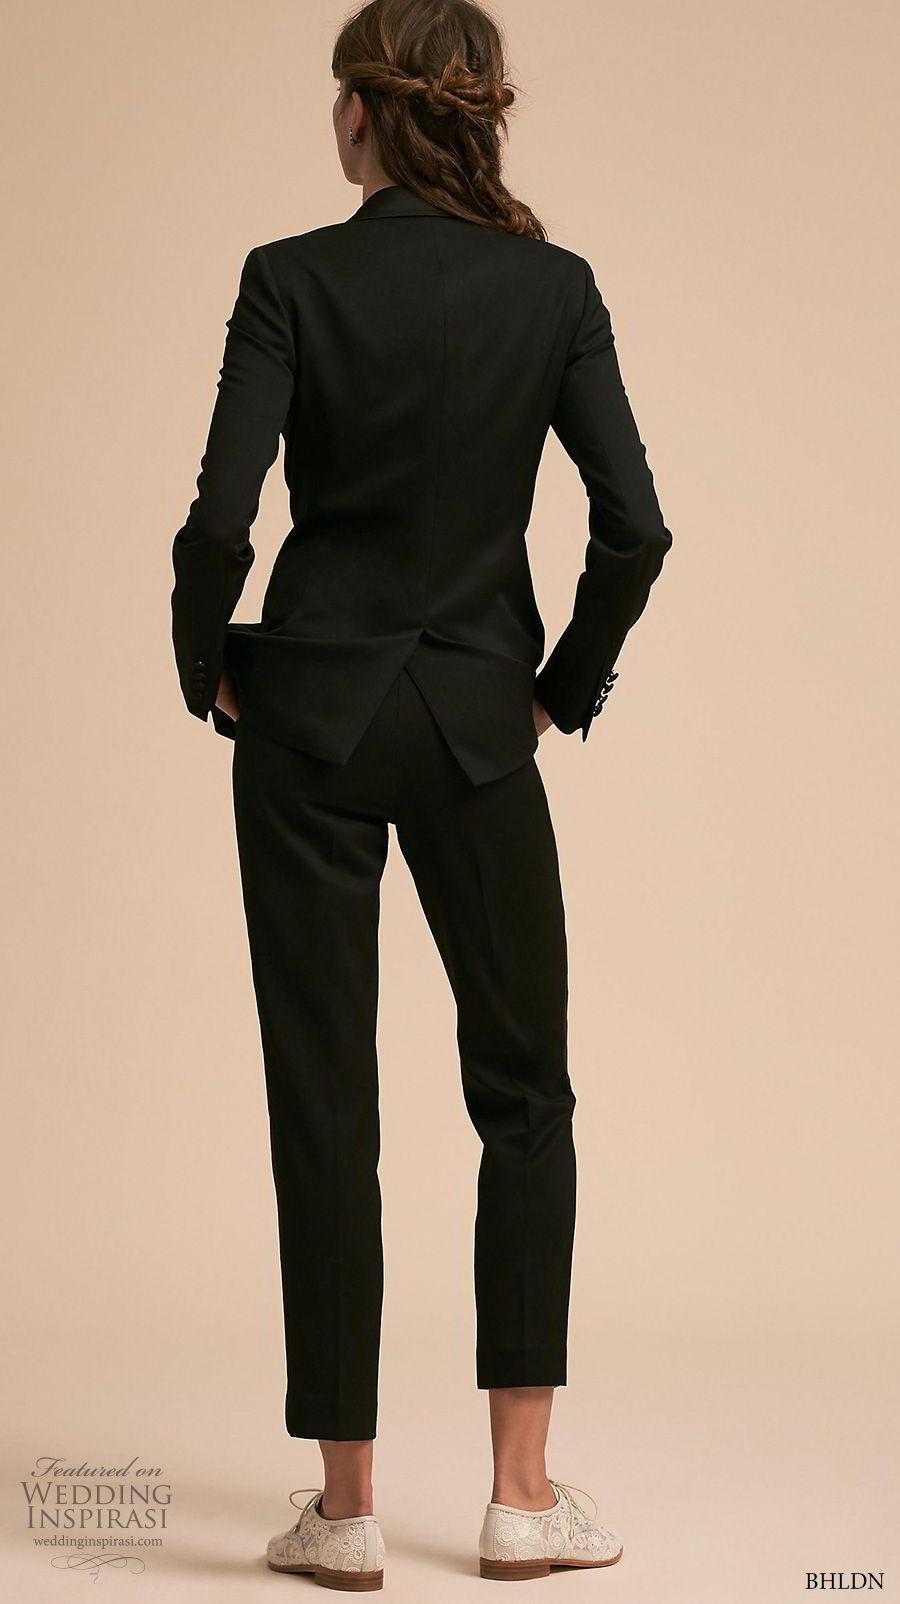 bhldn 2018 away bridal black blazer kipp pants tuxedo set bv